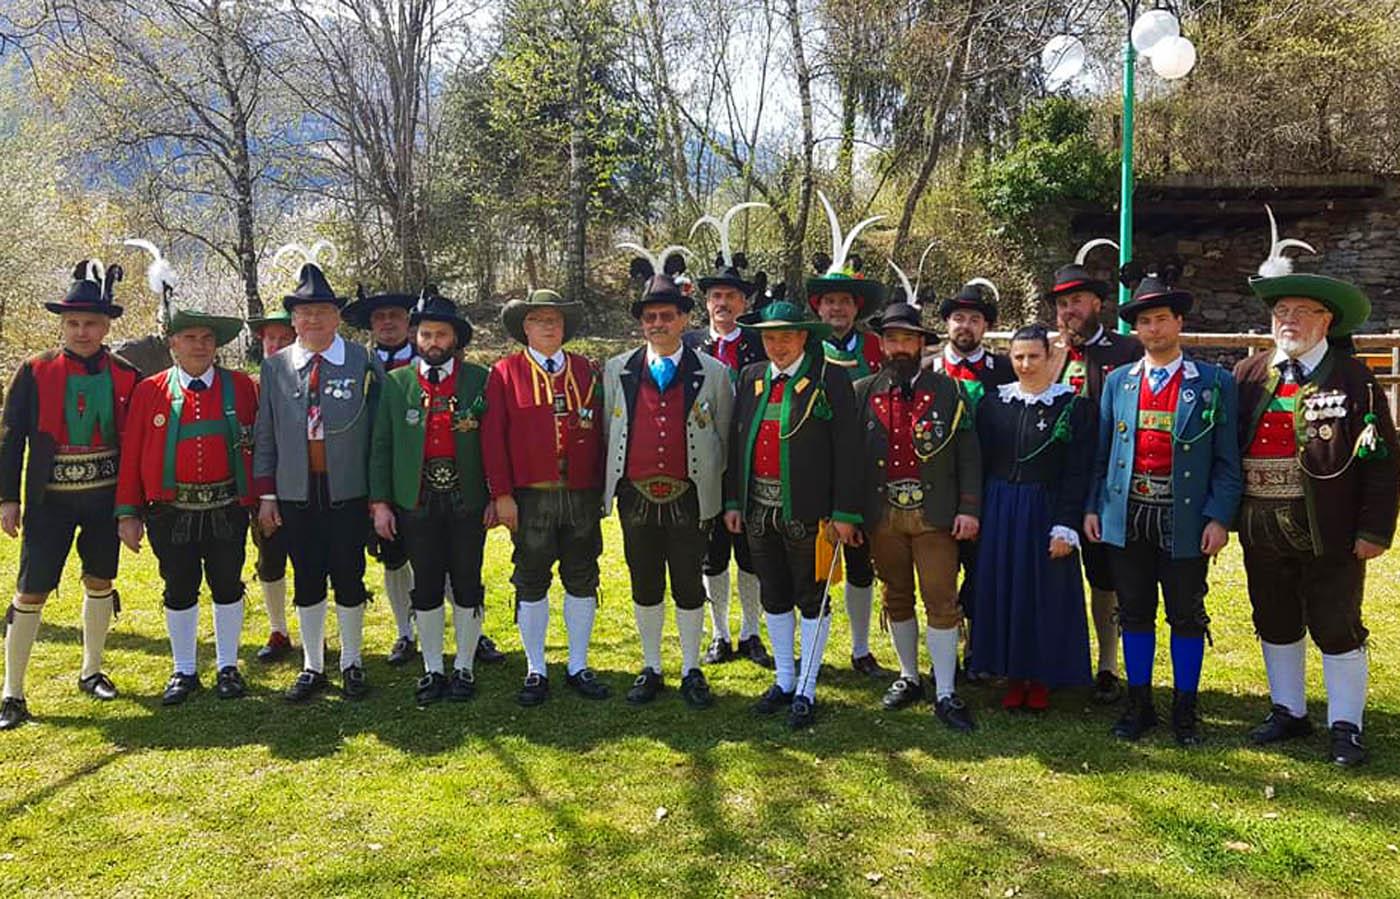 Tiroler Gedenkschießen feierlich eröffnet